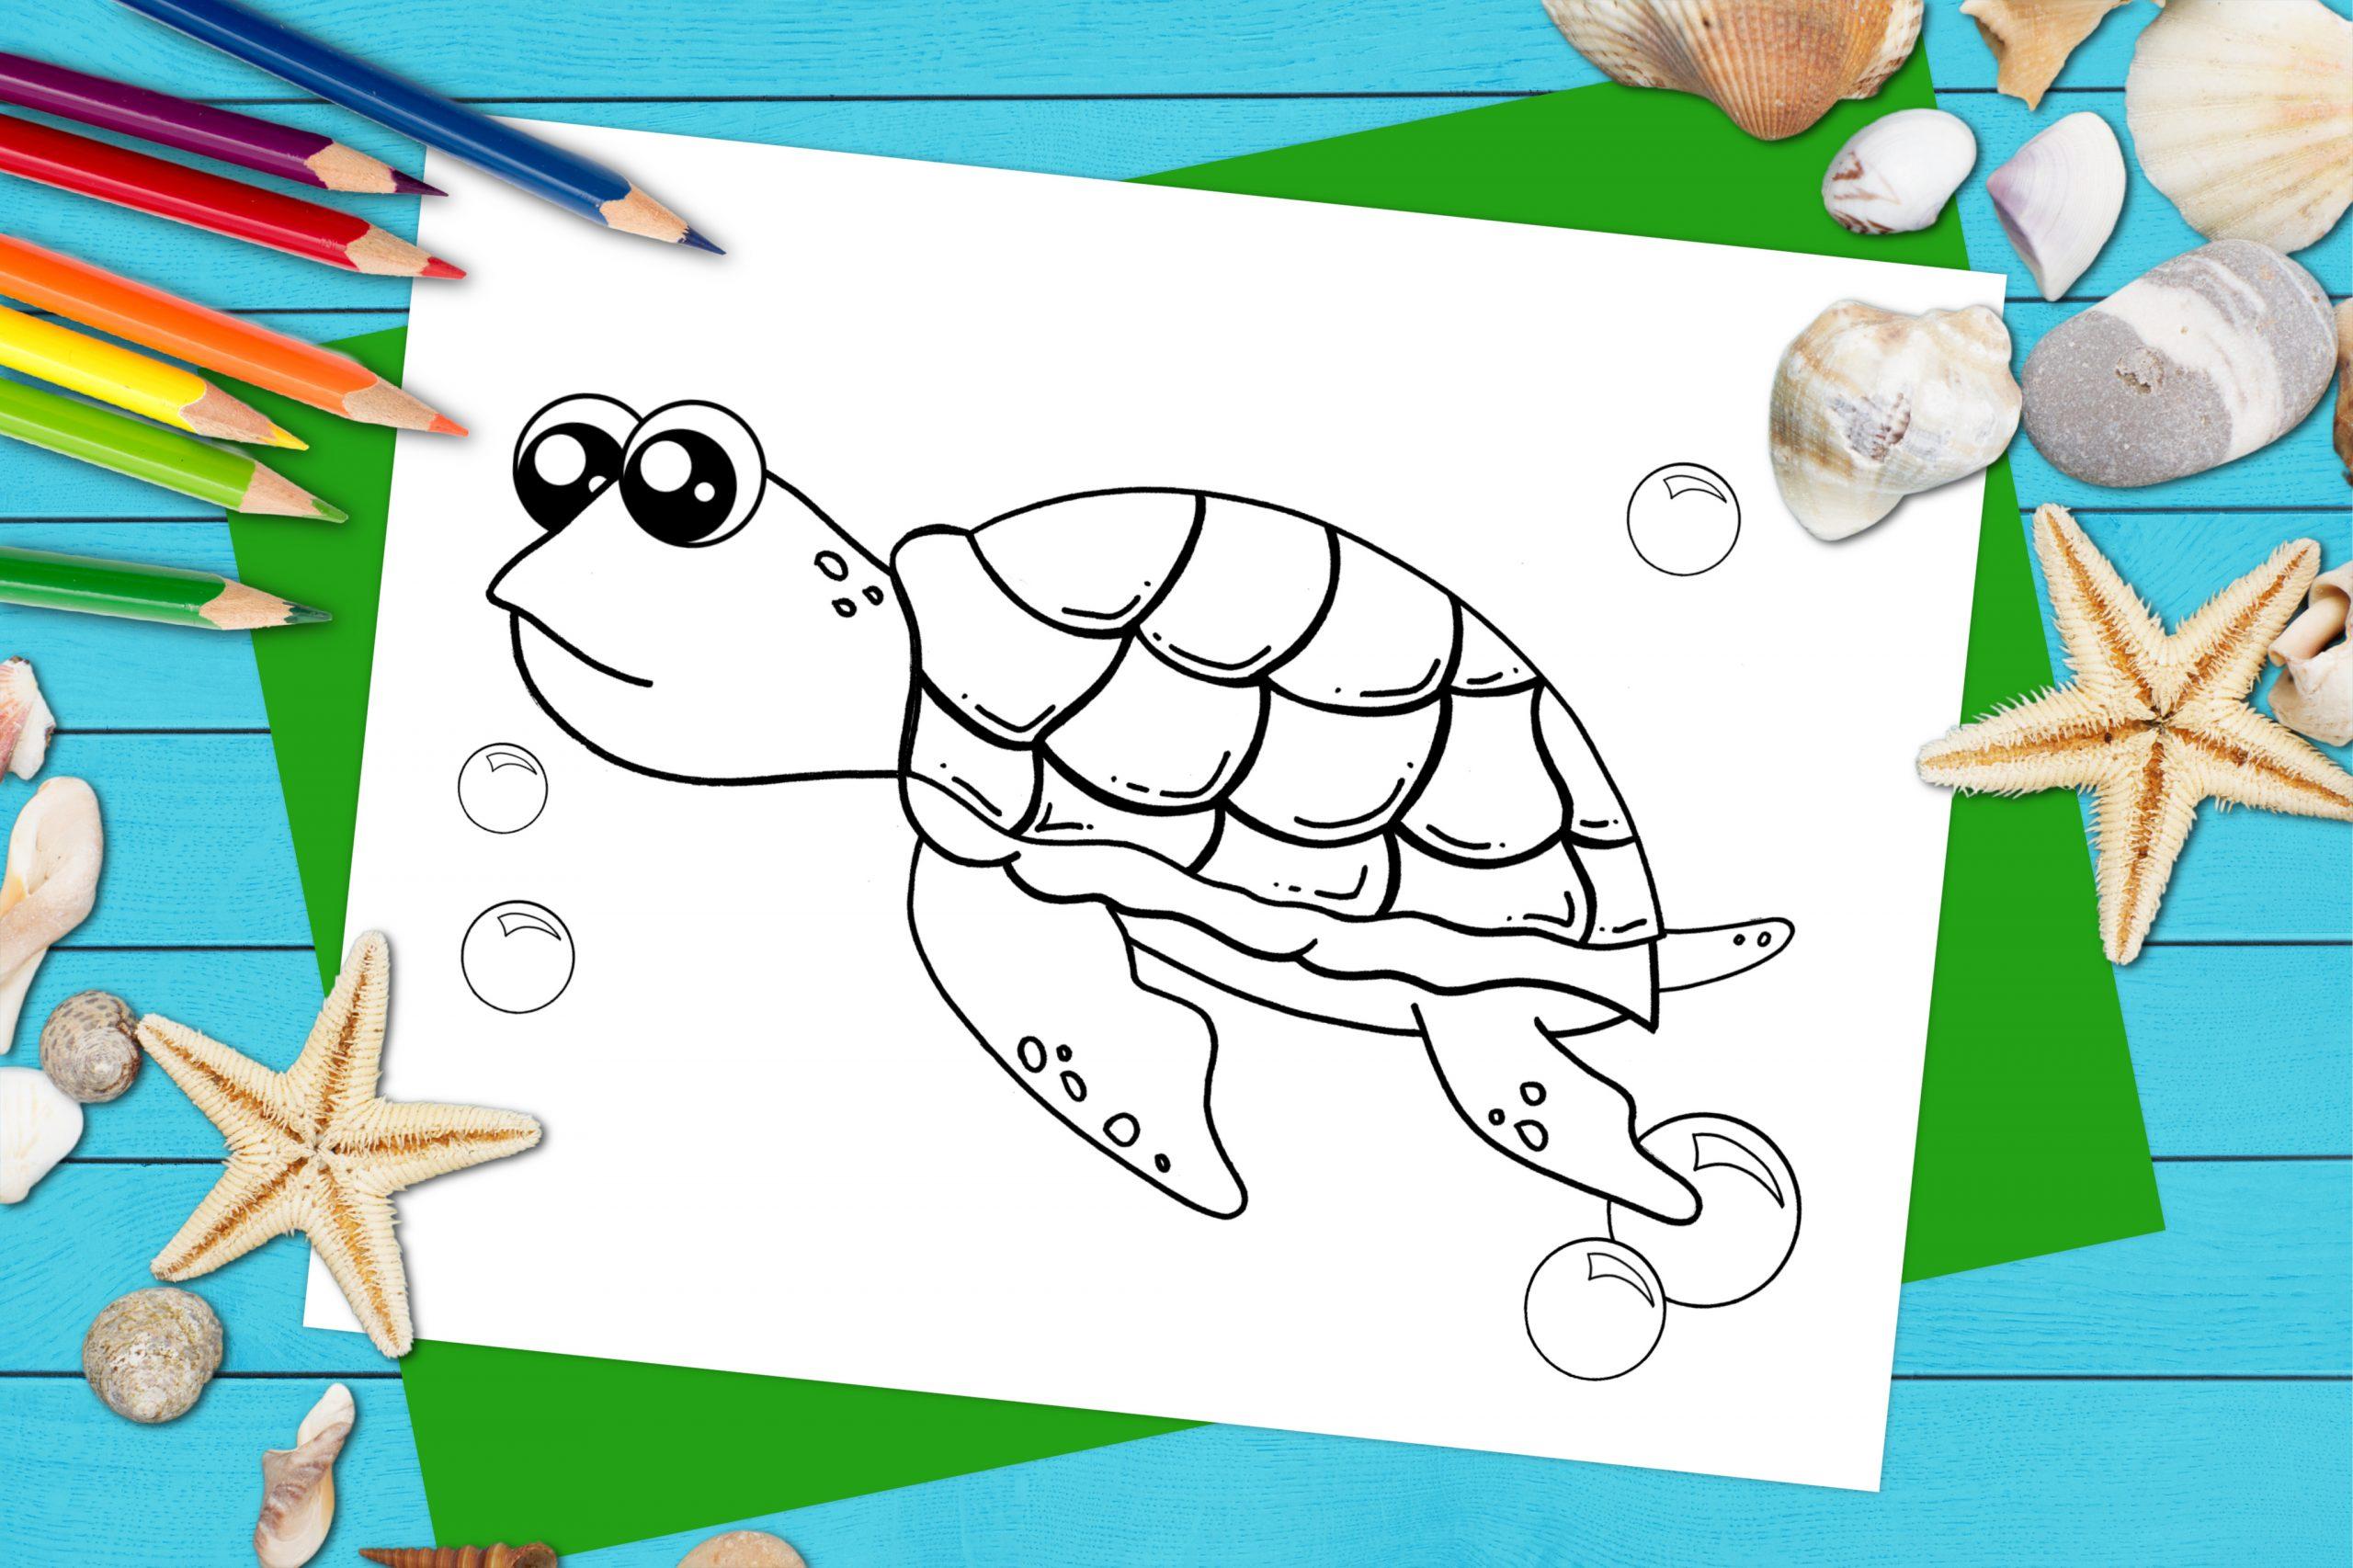 Free Printable Sea Turtle Ocean Animal Coloring Page for kids